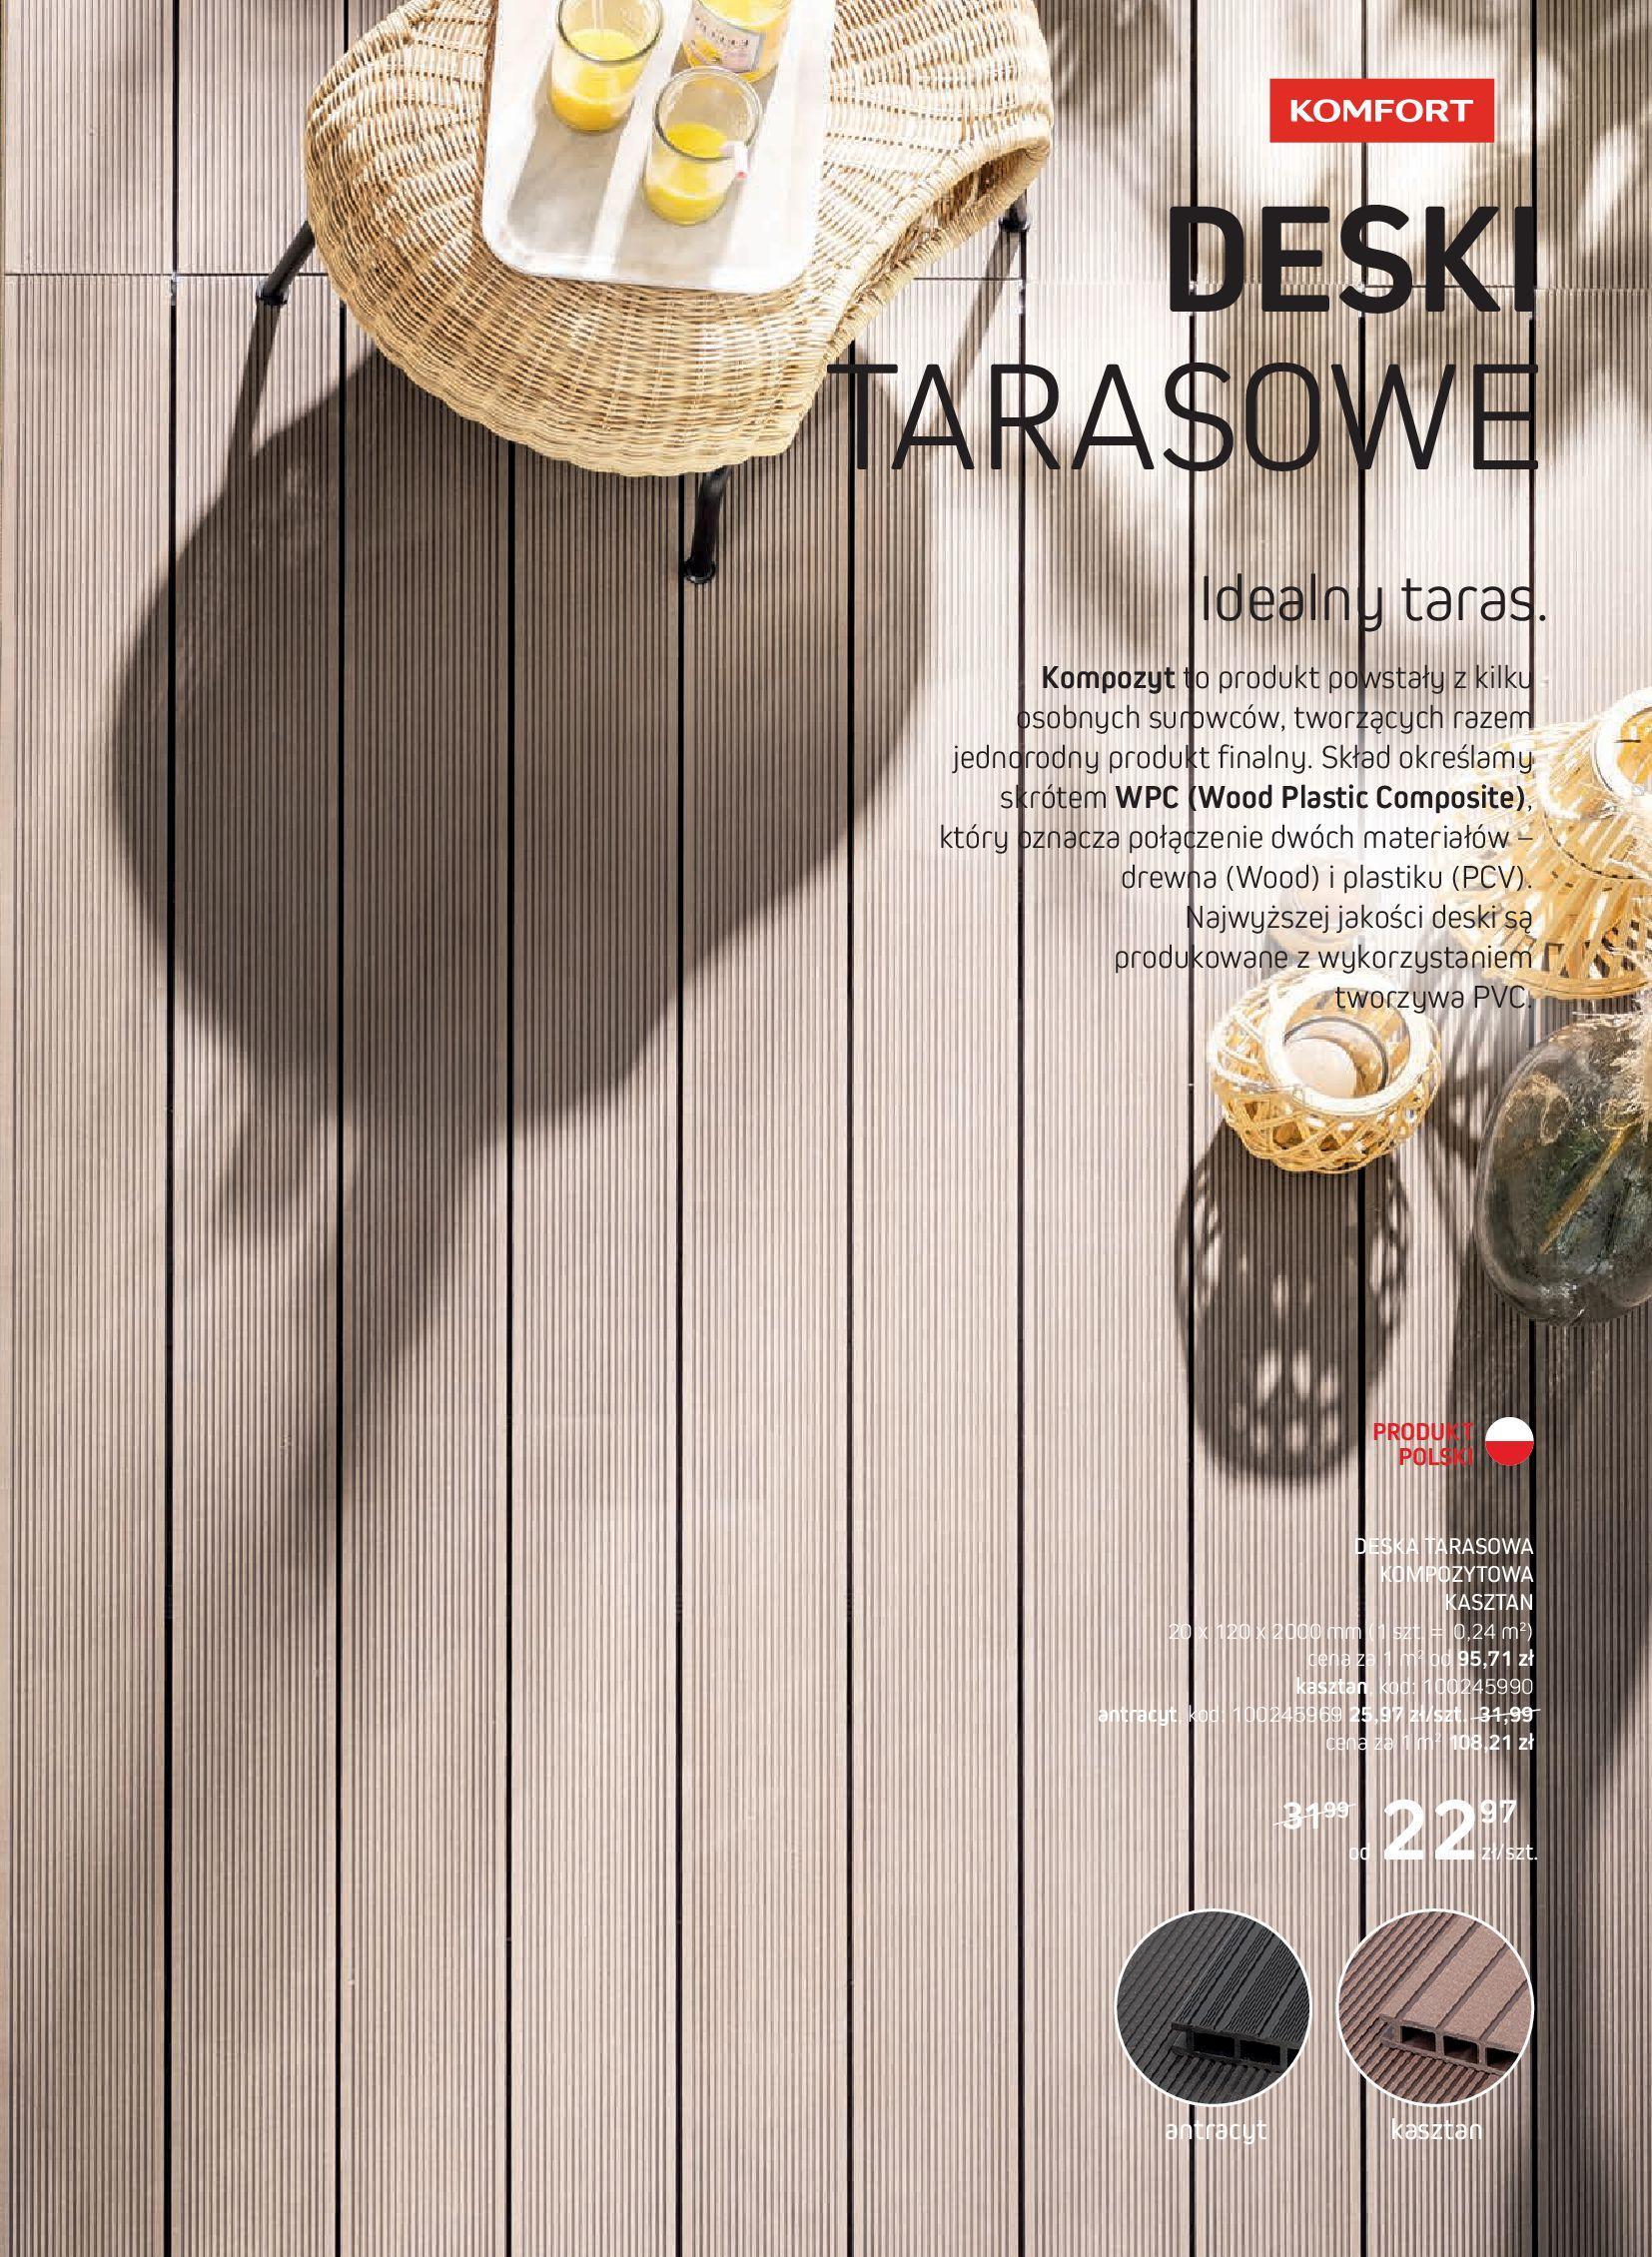 Gazetka Komfort: Gazetka Komfort - Katalog podłogi i drzwi 2021-06-16 page-67